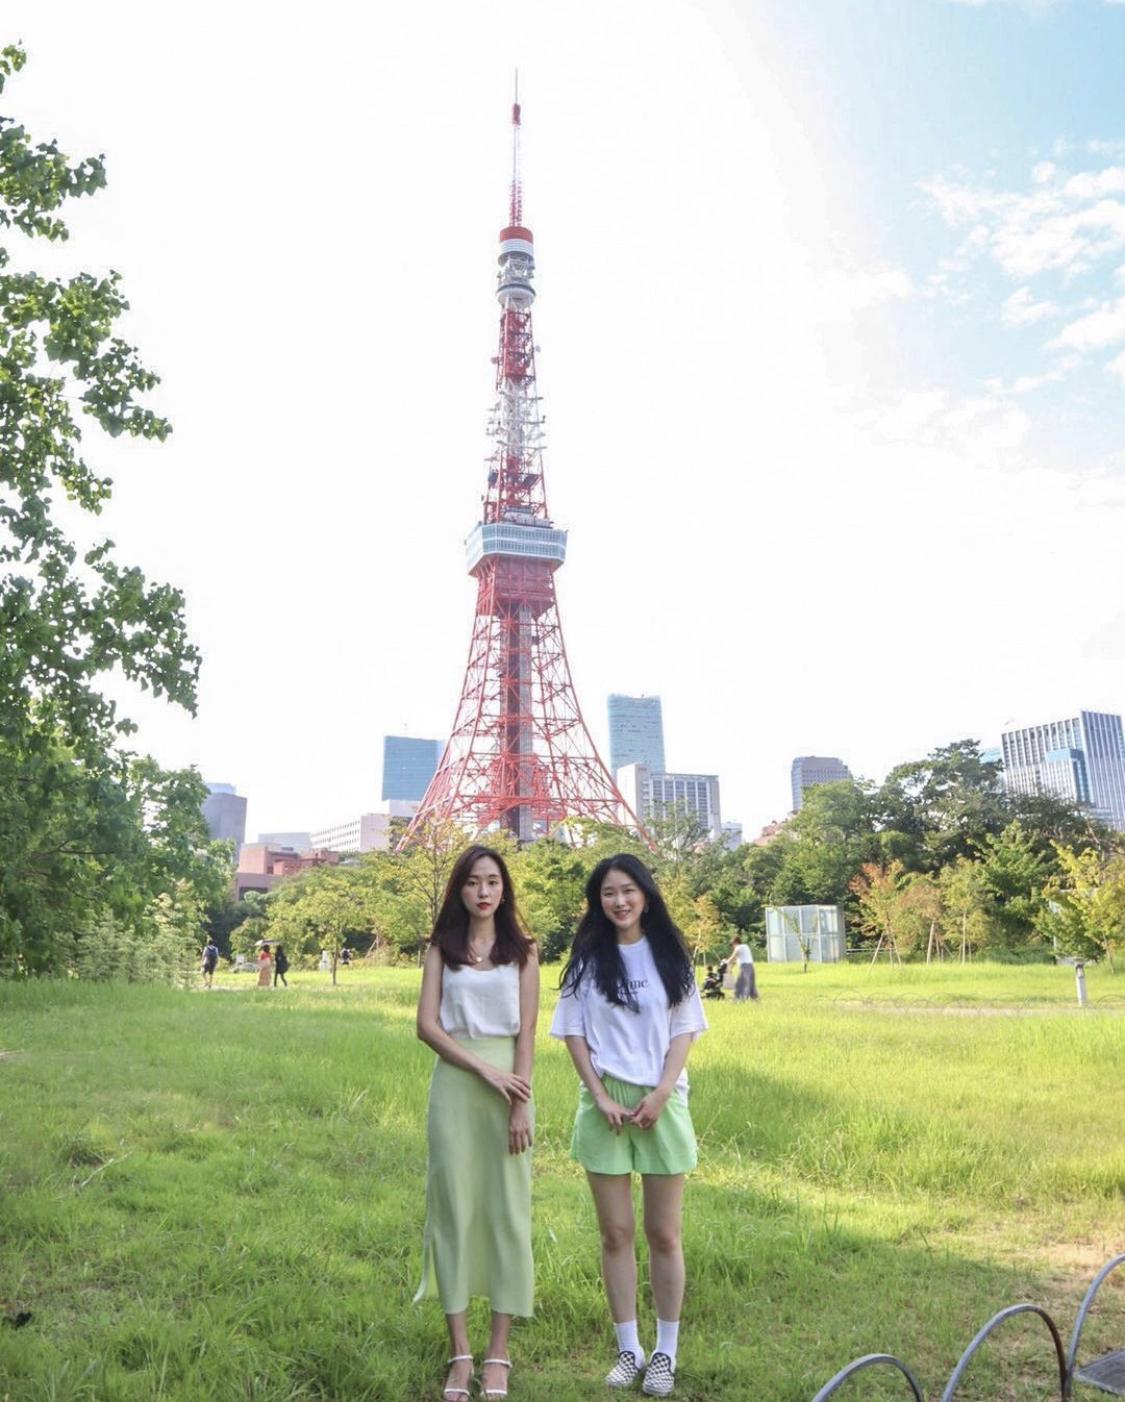 東京タワー前_女性二人